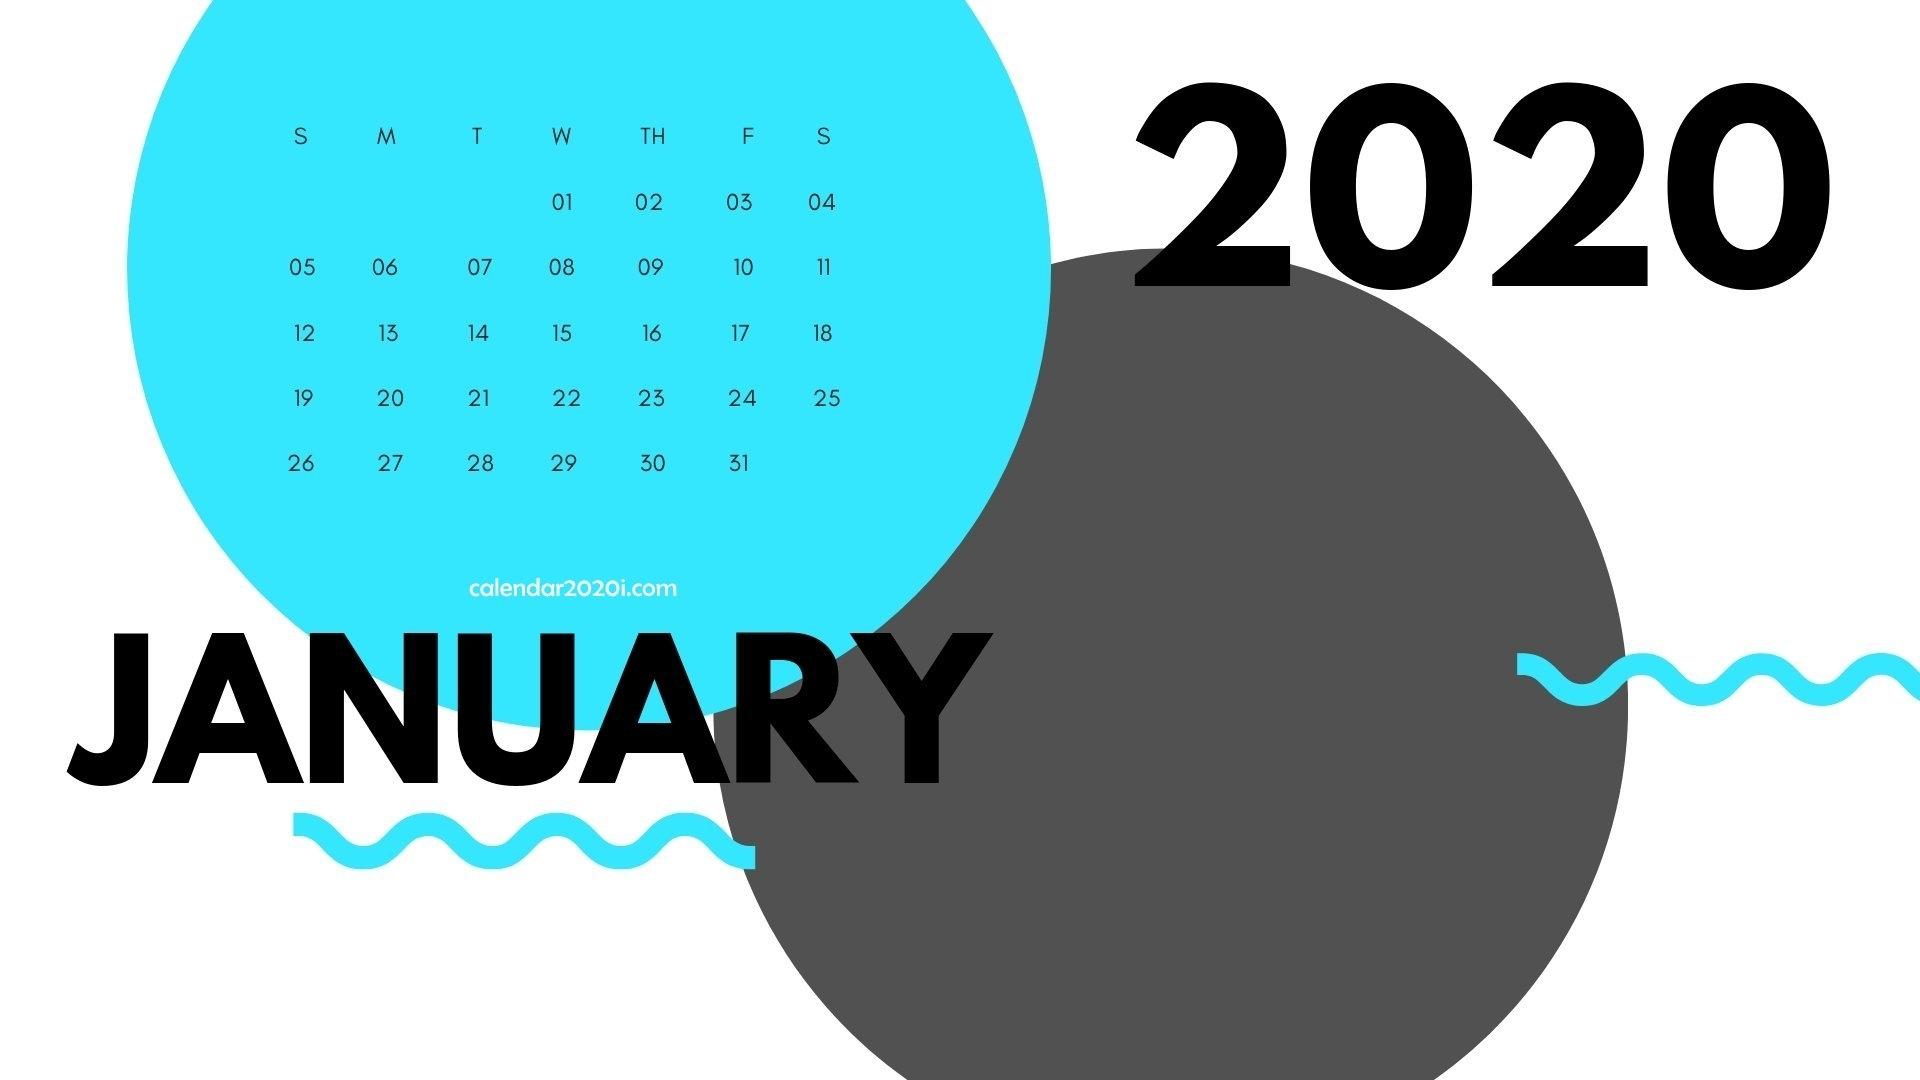 2020 Calendar Printable Monthly Templates | Calendar 2020 with Free 8/2019 -5/ 2020 Printable Calendar